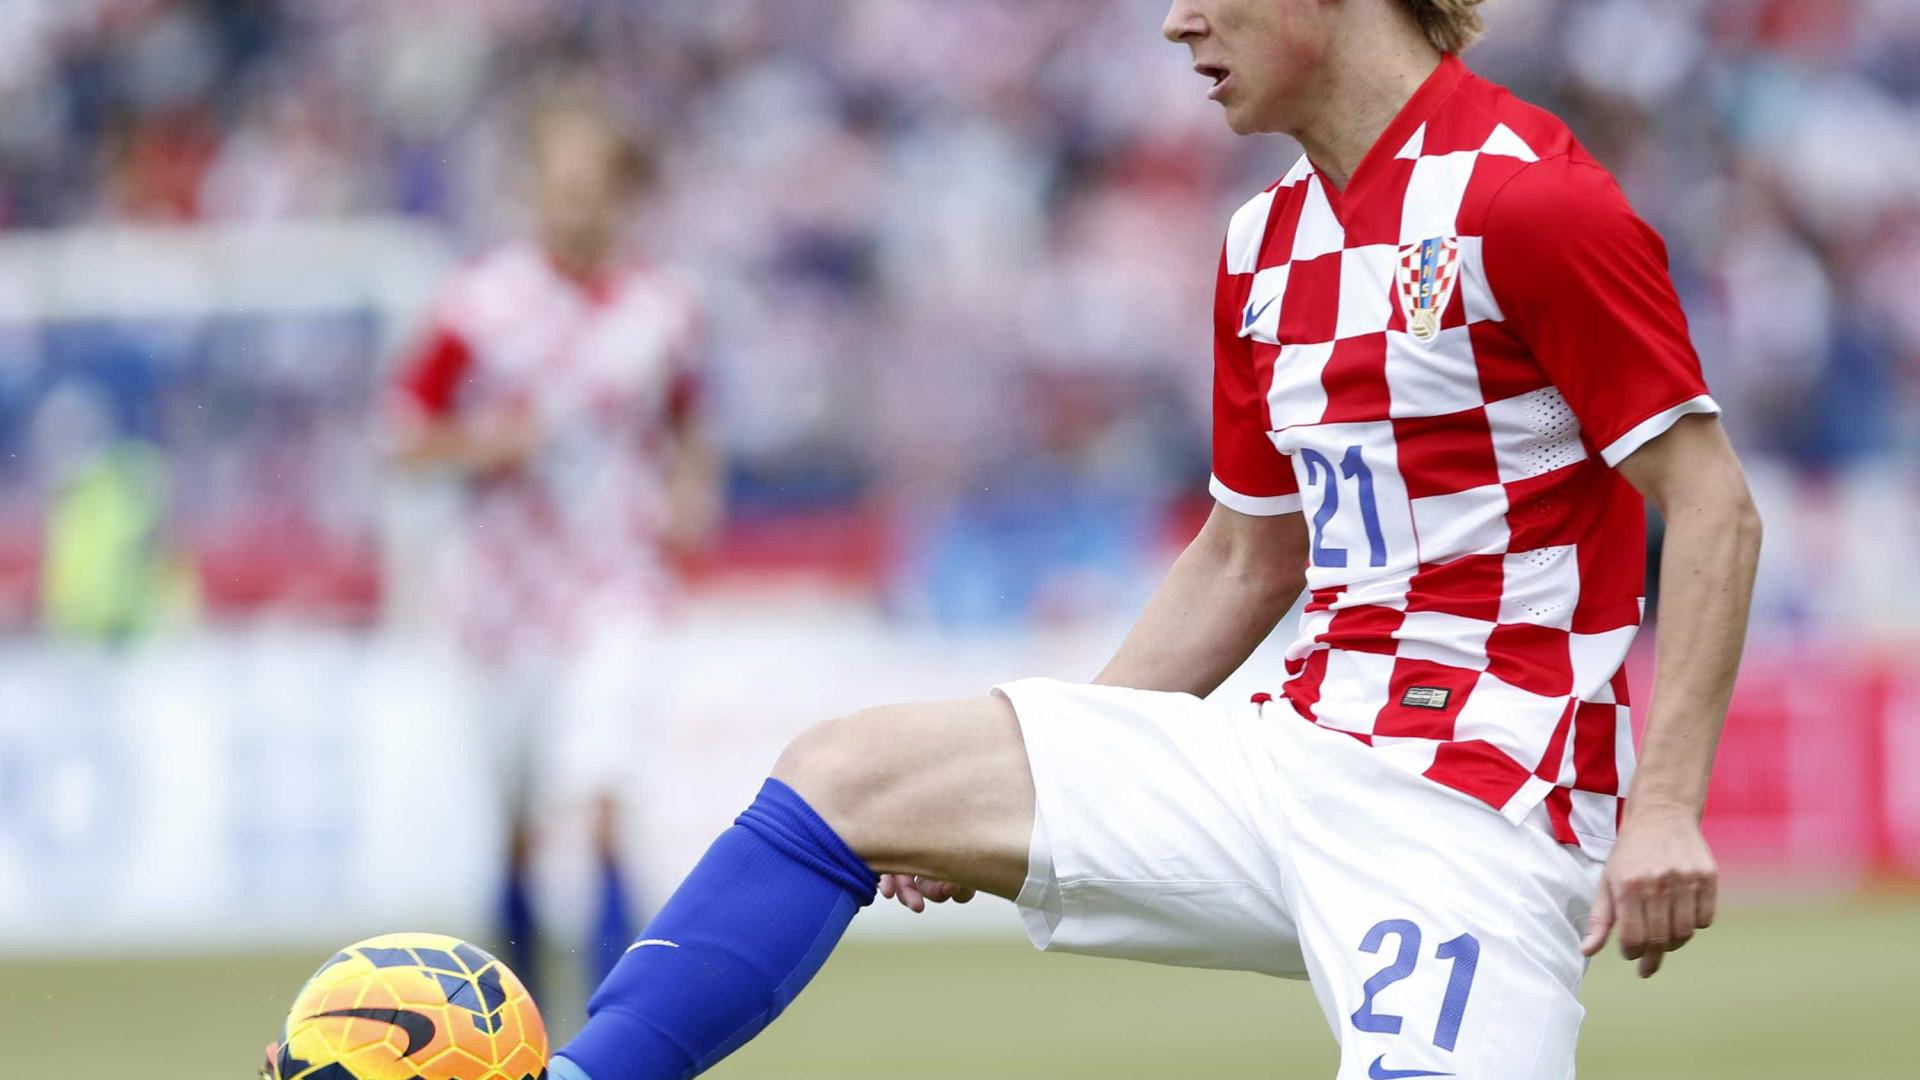 FIFA investiga polémico vídeo de jogador croata após vitória sobre Rússia